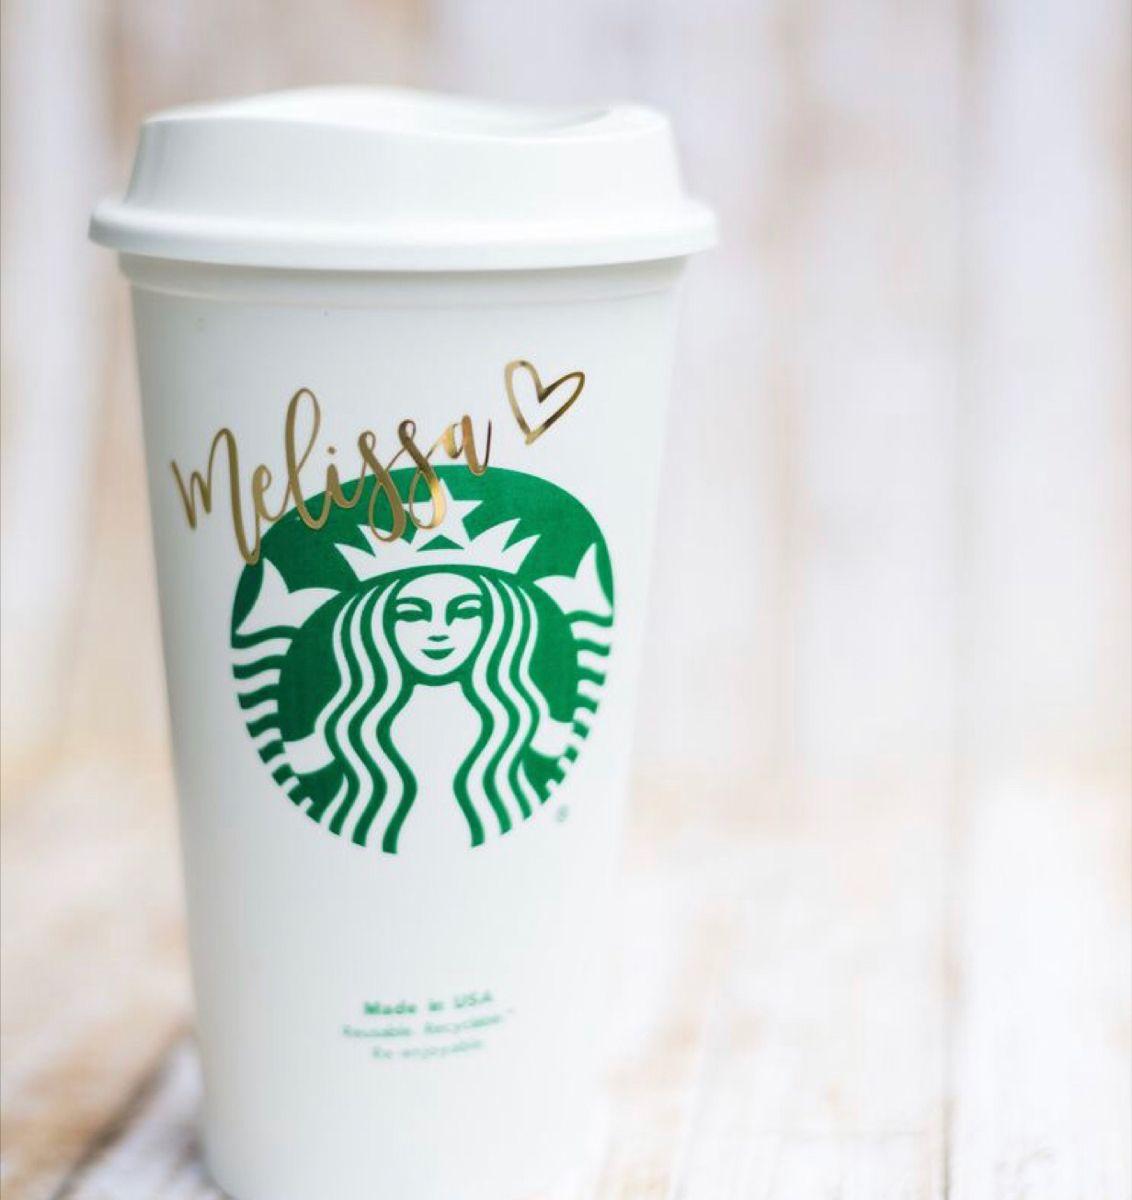 Pin By Torres Hernandez On Starbucks Cups Ideas In 2020 Personalized Starbucks Cup Starbucks Cups Custom Starbucks Cup